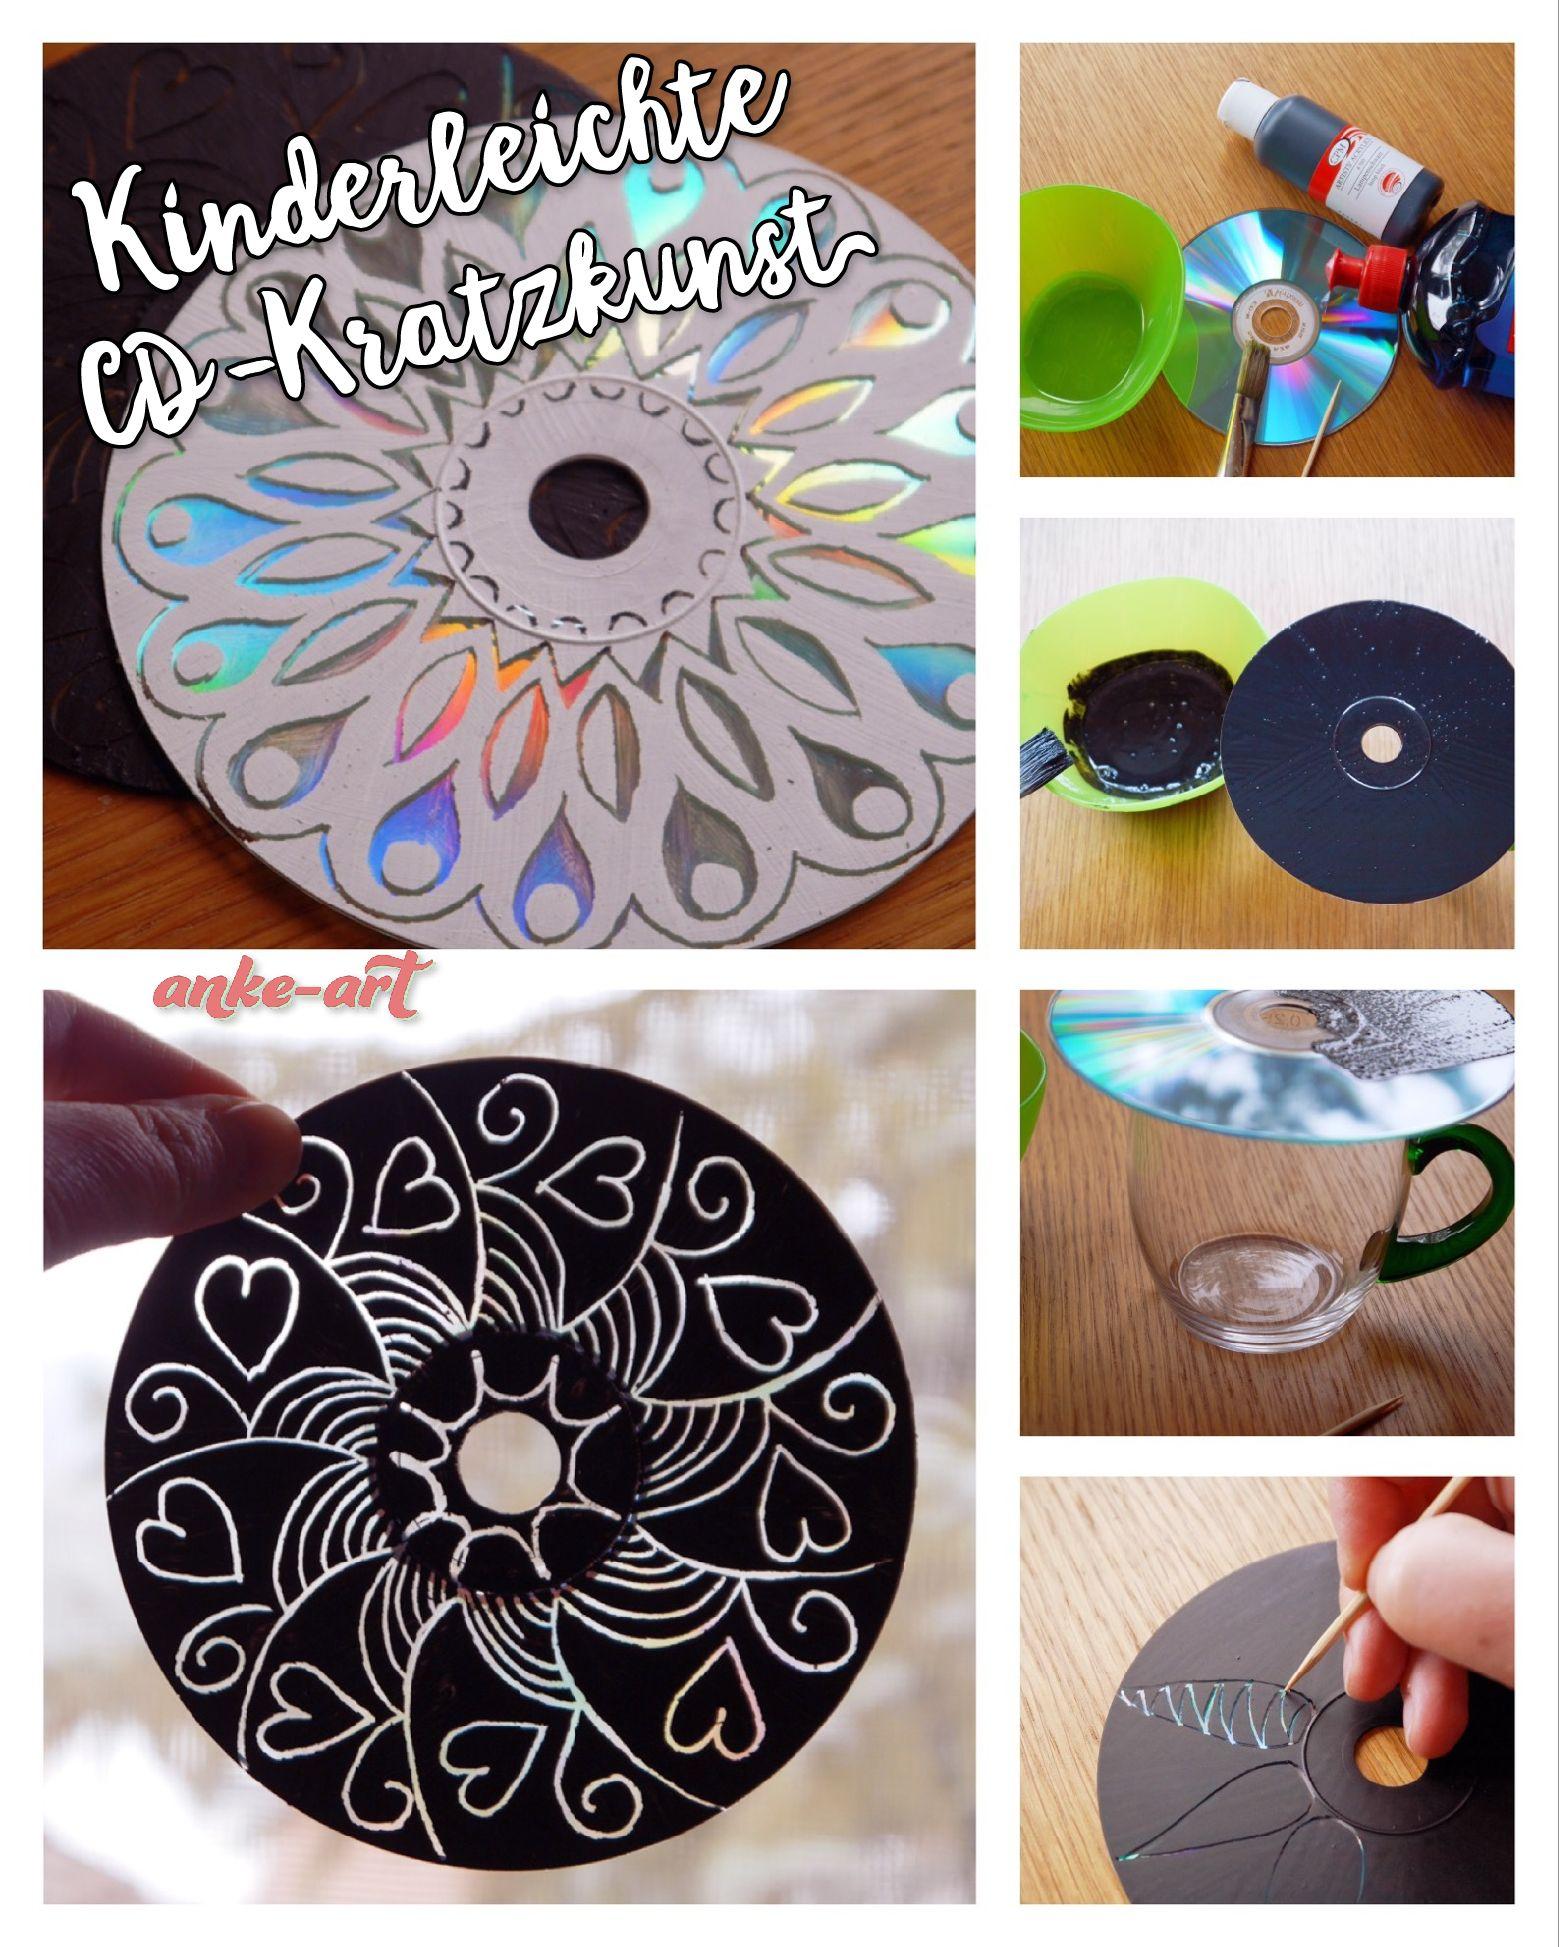 kinderleichte cd kratzkunst upcycling cd 39 s acrylfarbe zahnstocher cd upcycling pinterest. Black Bedroom Furniture Sets. Home Design Ideas